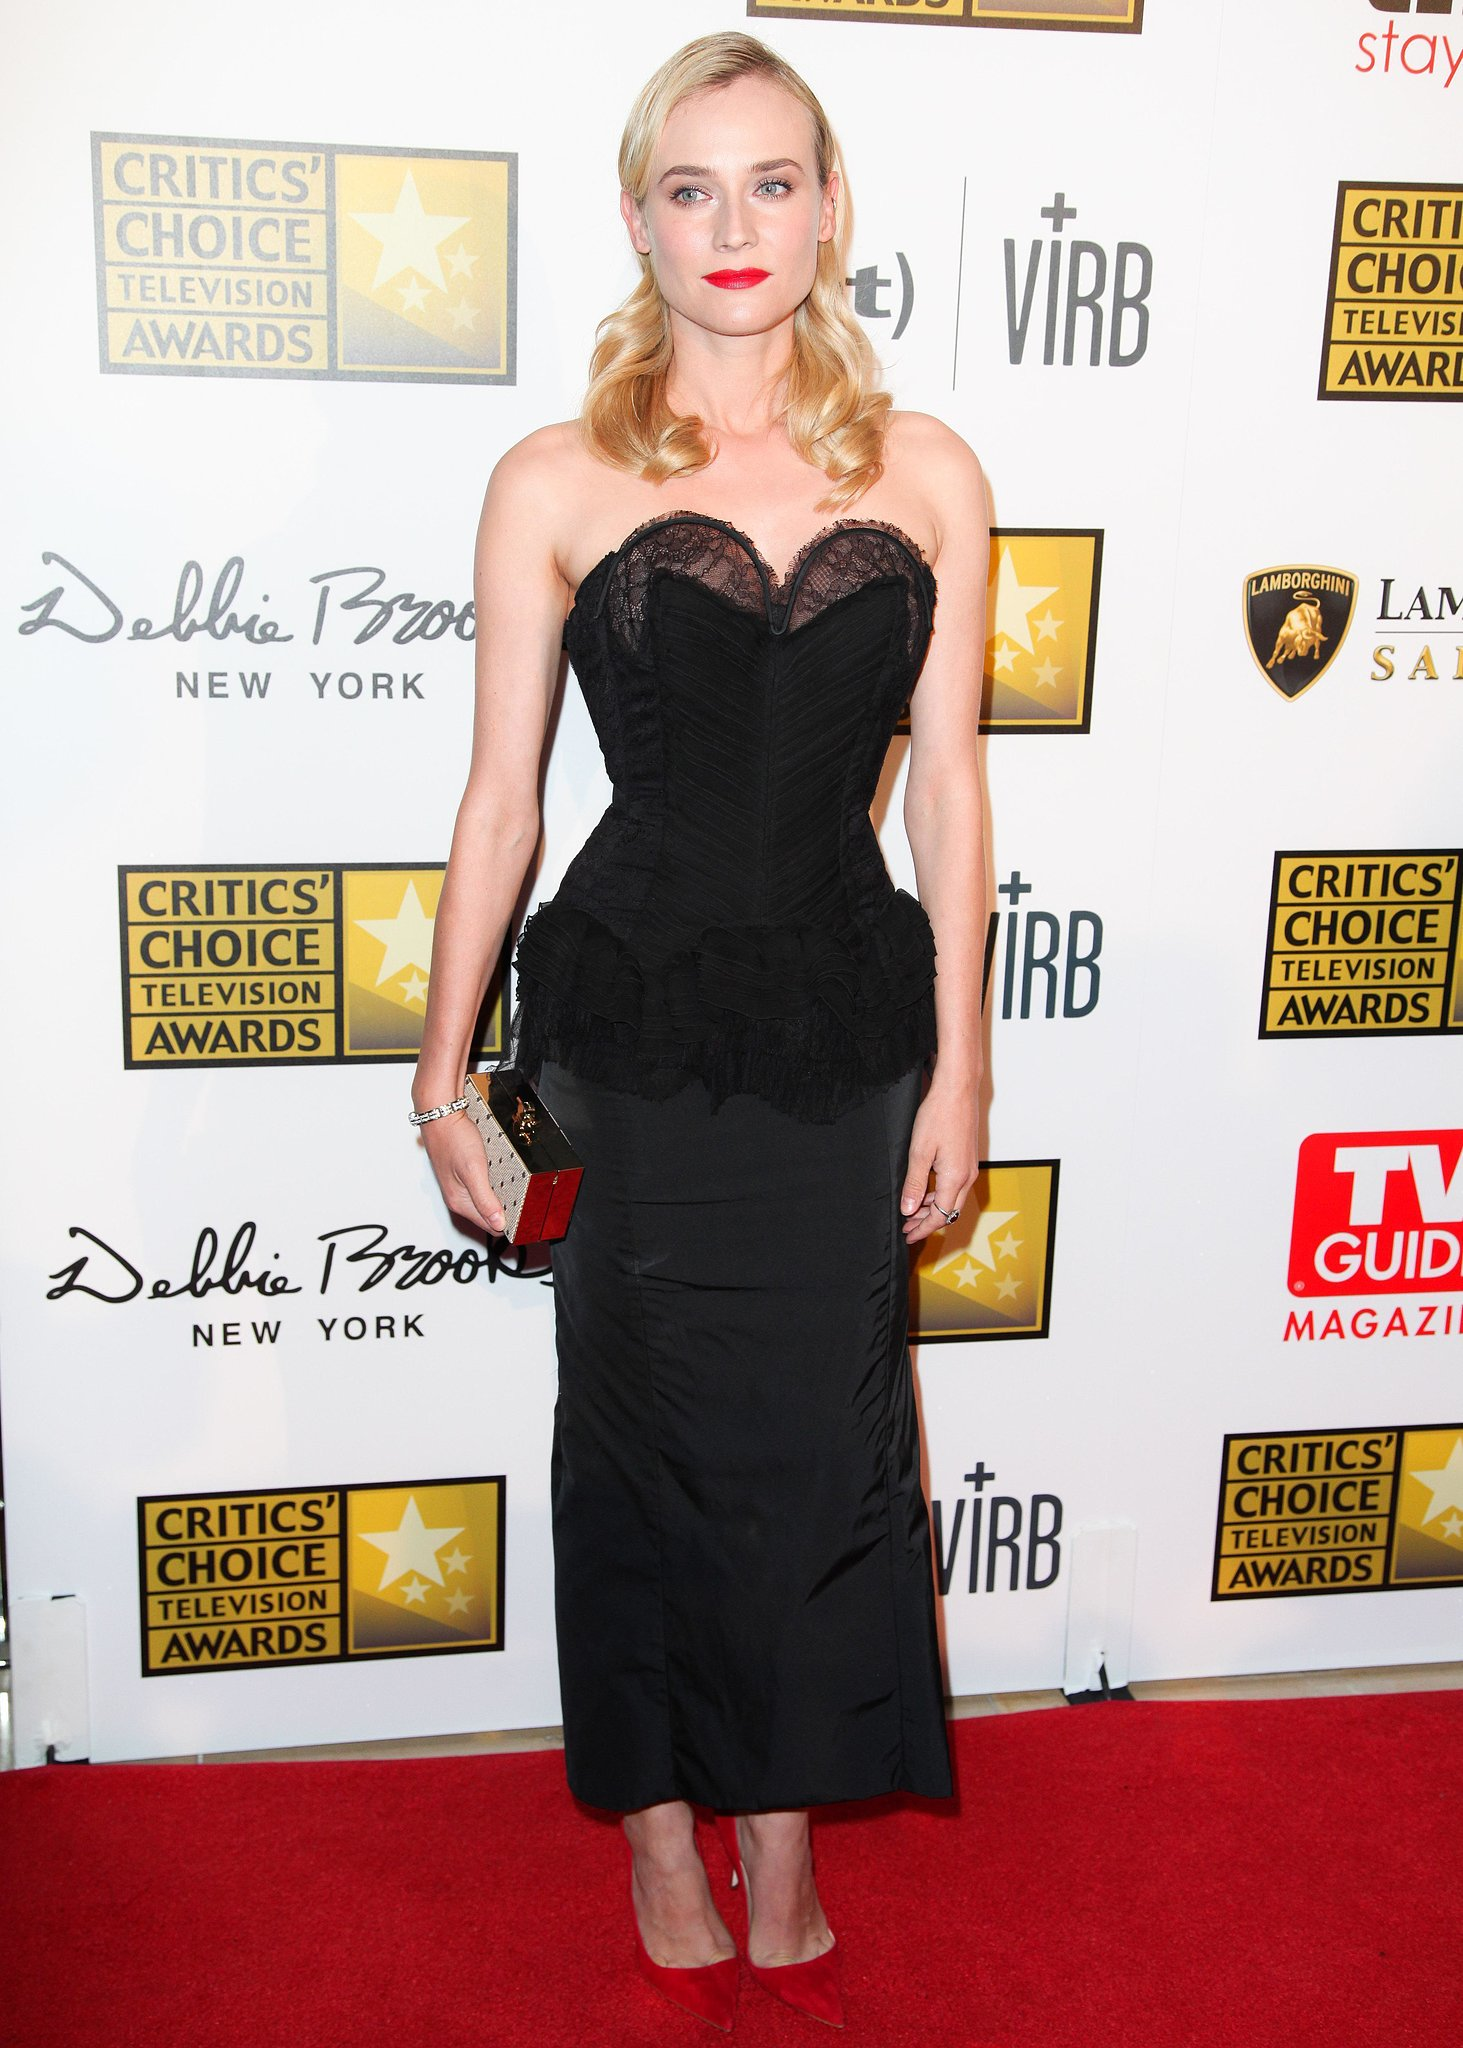 Diane Kruger at the 2013 Critics' Choice Television Awards in Los Angeles.  Source: Aleks Kocev/BFAnyc.com